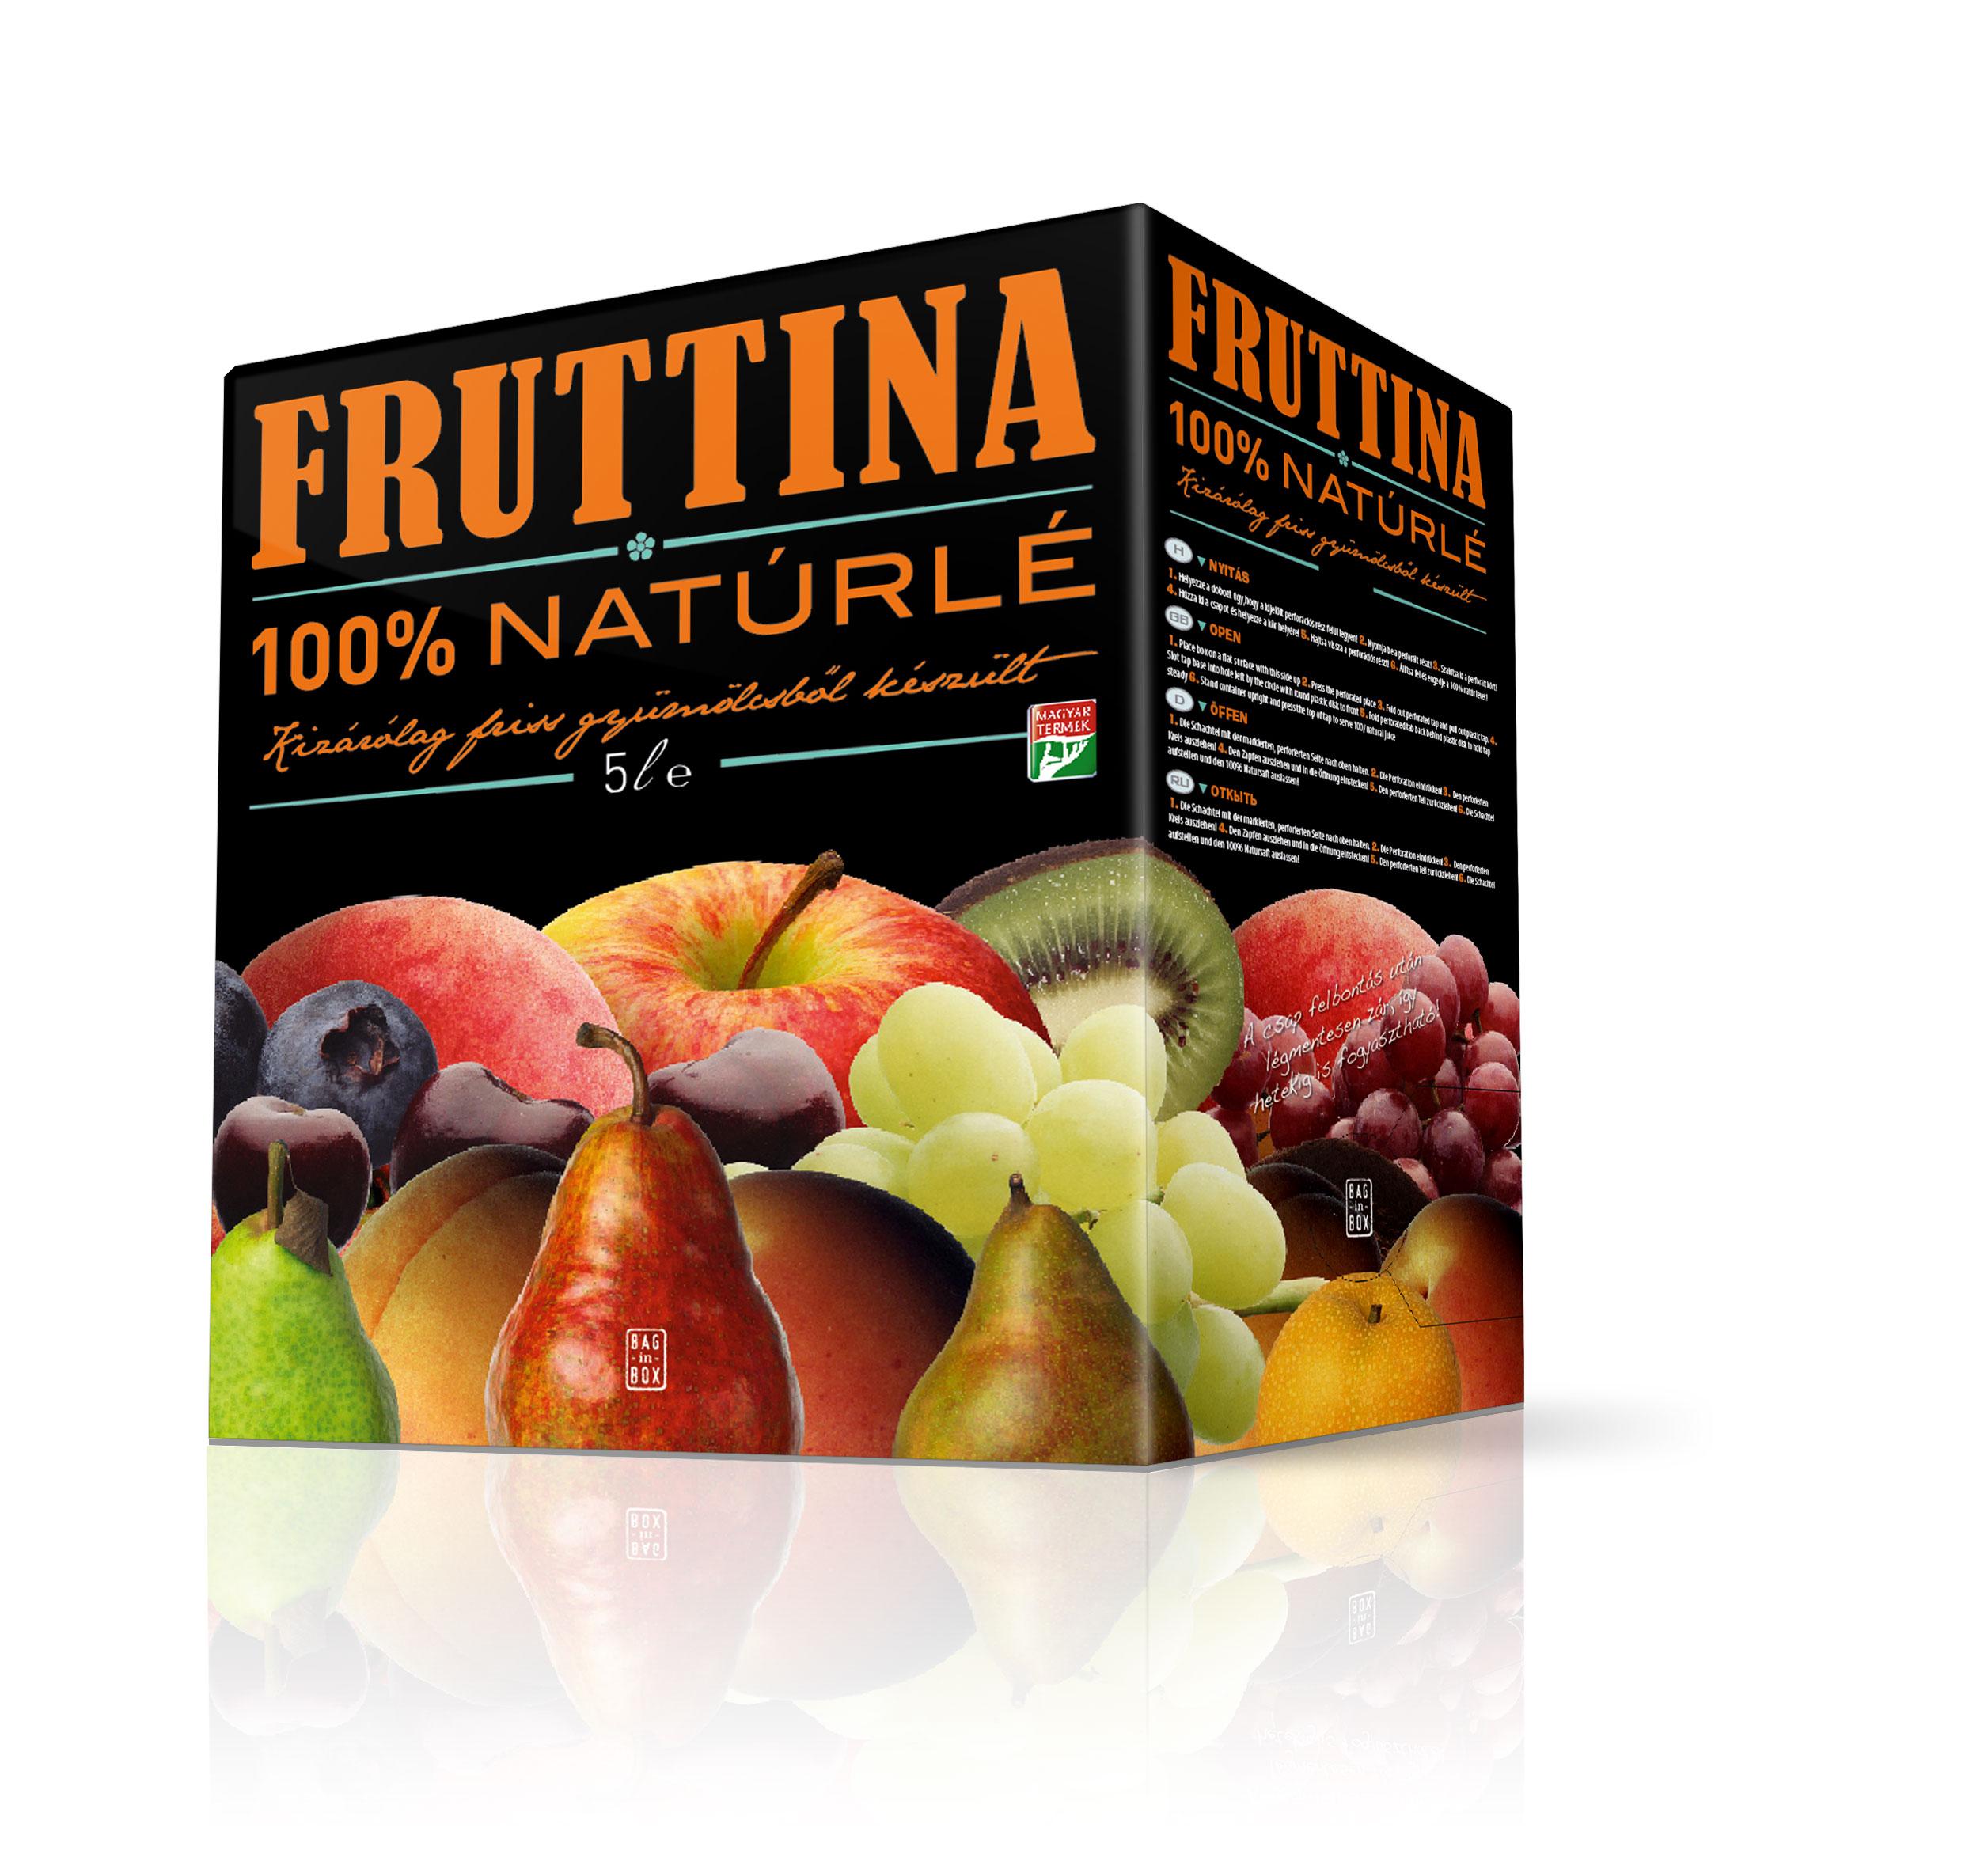 Fruttina_02_2.jpg